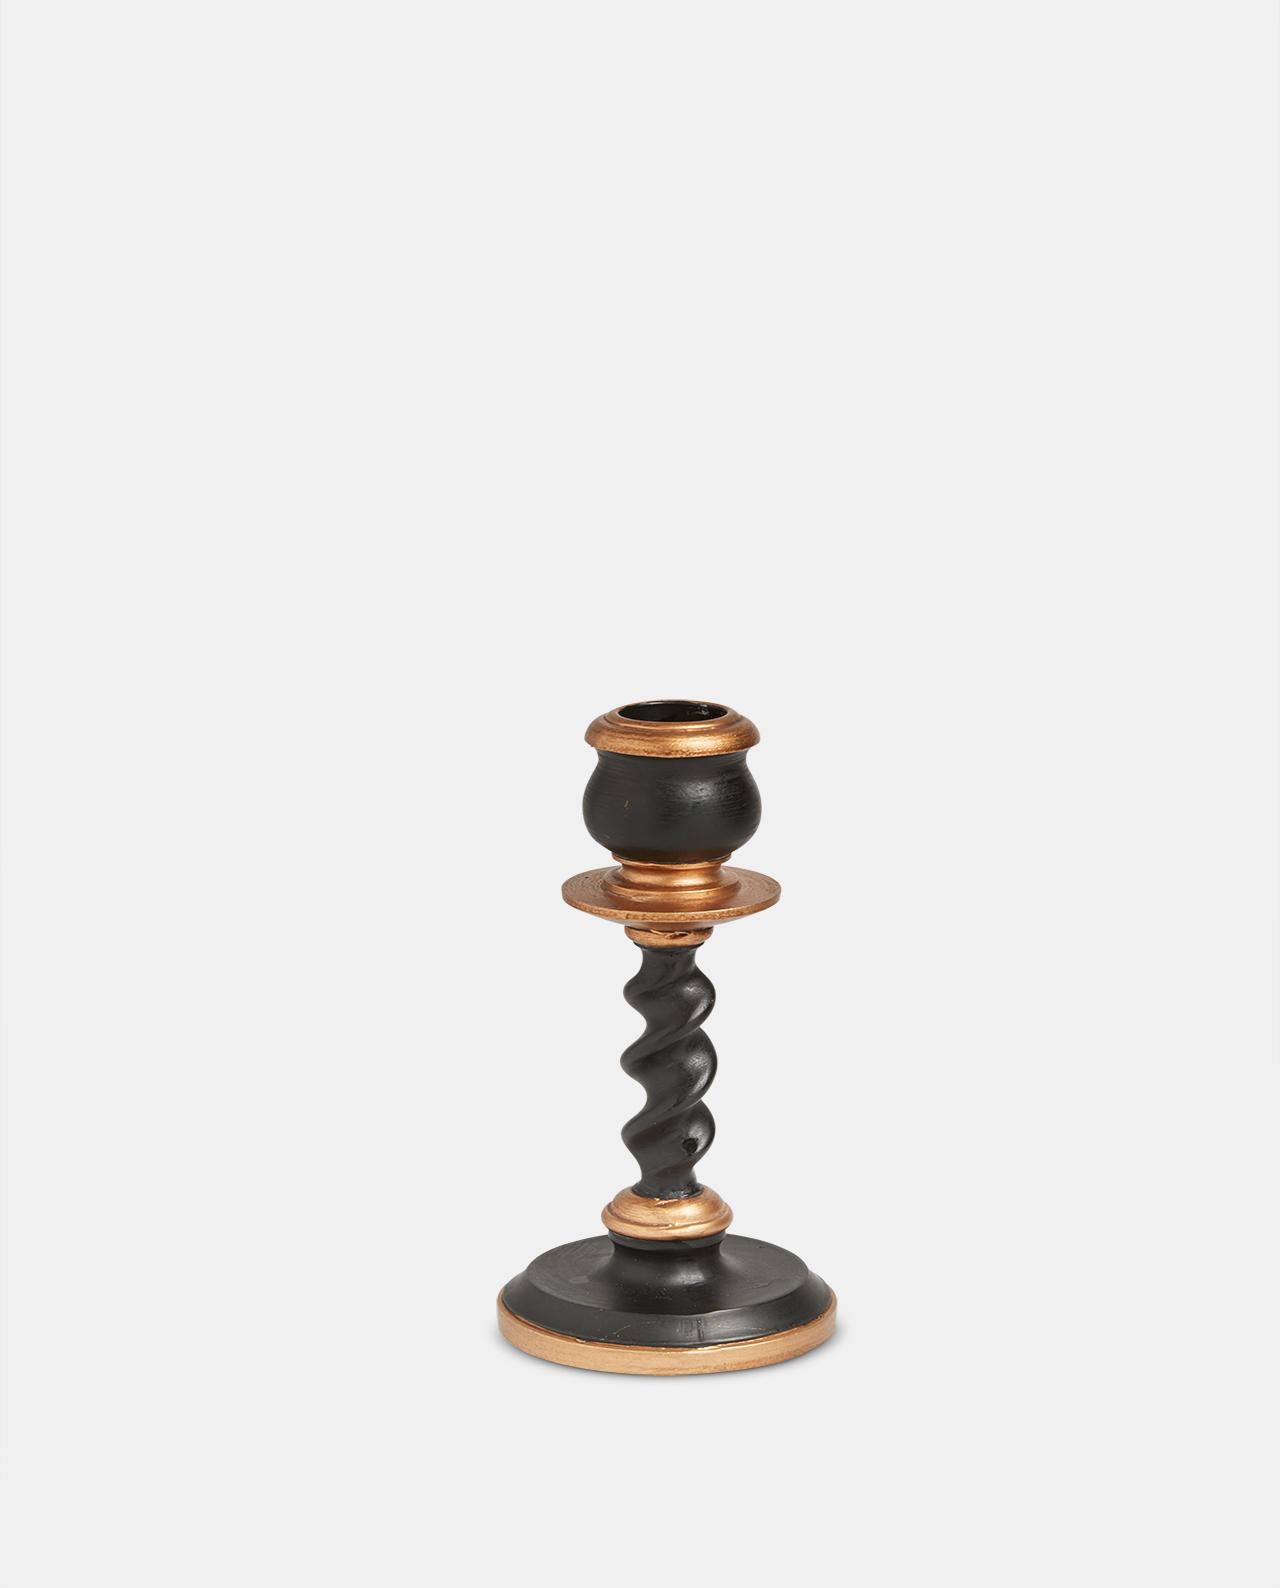 Black & Gold Candlestick 15cm